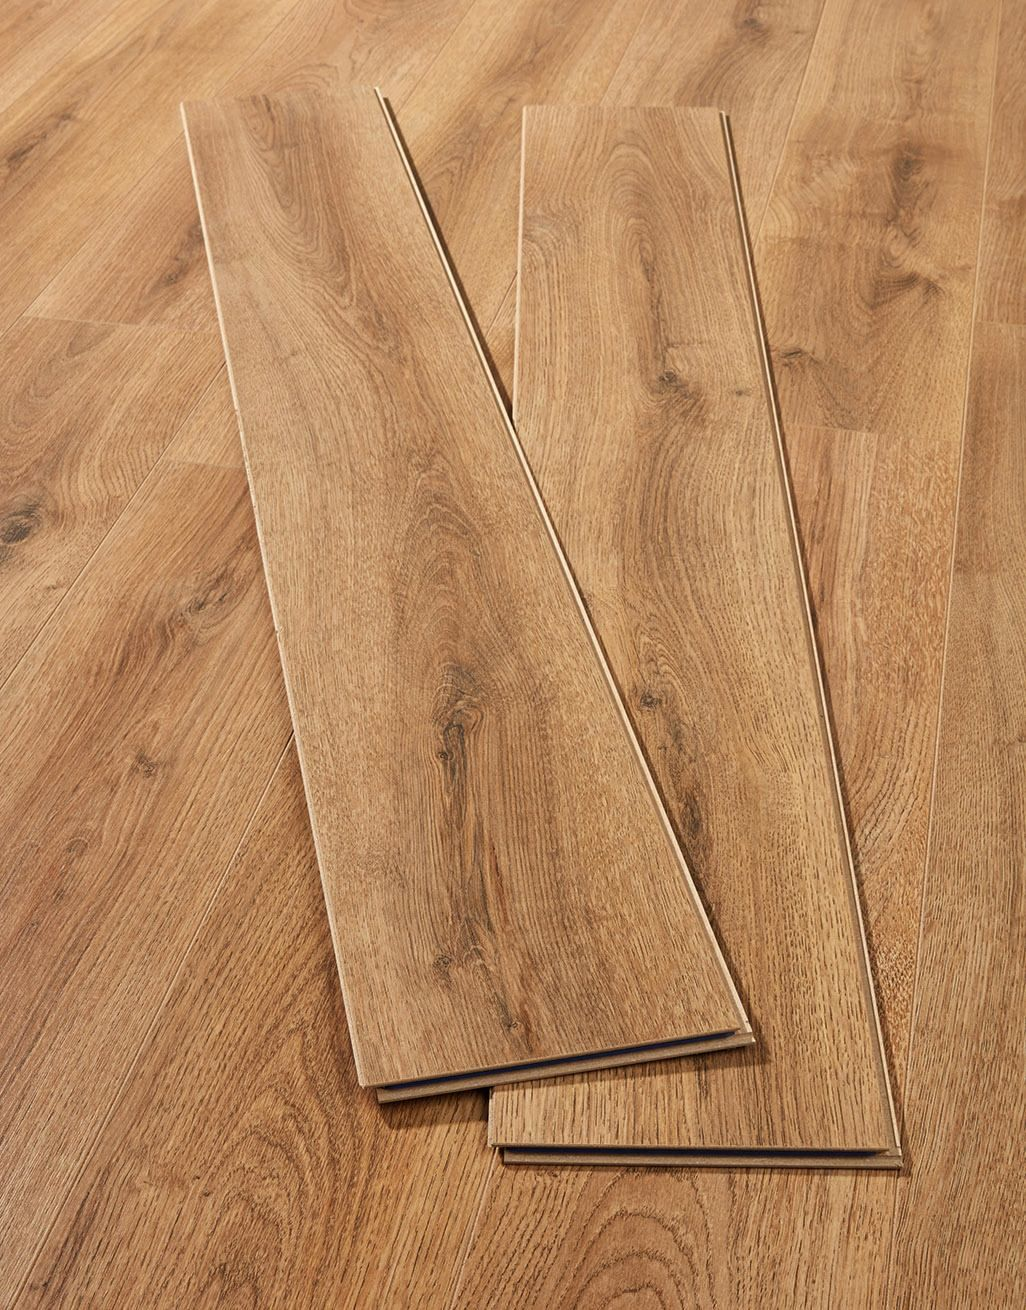 Summer Oak Laminate Flooring, 8mm Oak Laminate Flooring